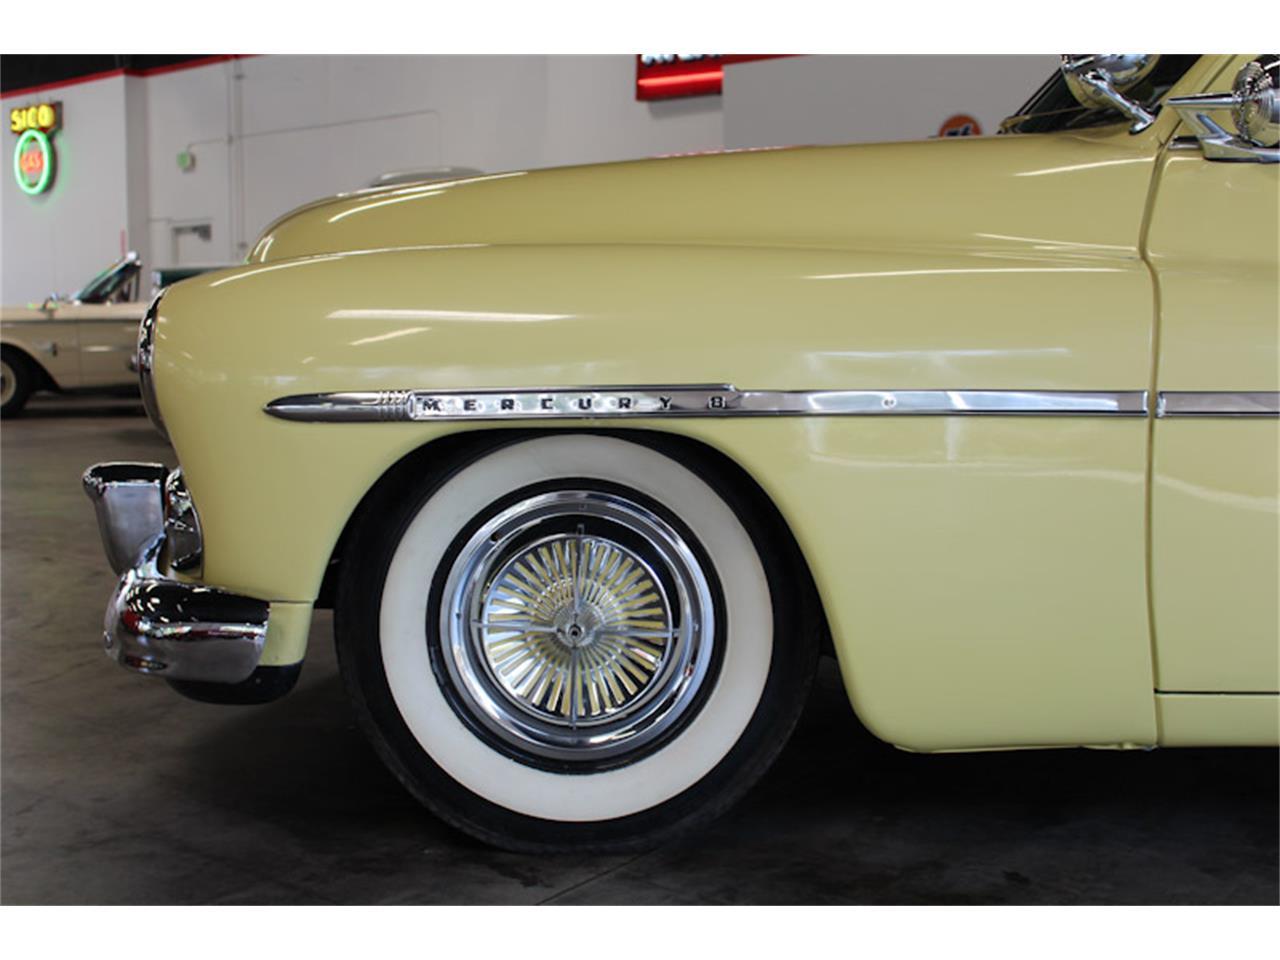 Large Picture of 1950 Mercury Hot Rod located in California - $29,990.00 - OJFQ